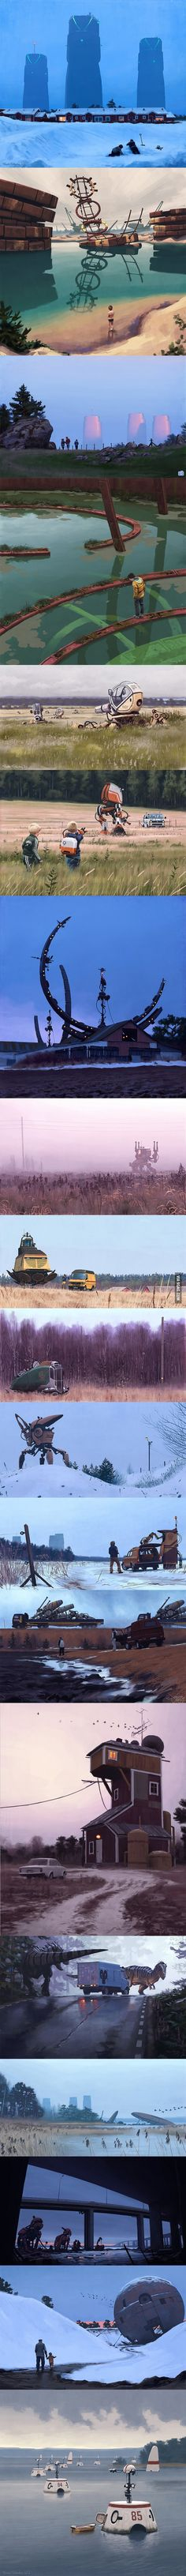 Incredible paintings of sci-fi Swedish suburbia by Simon Stålenhag